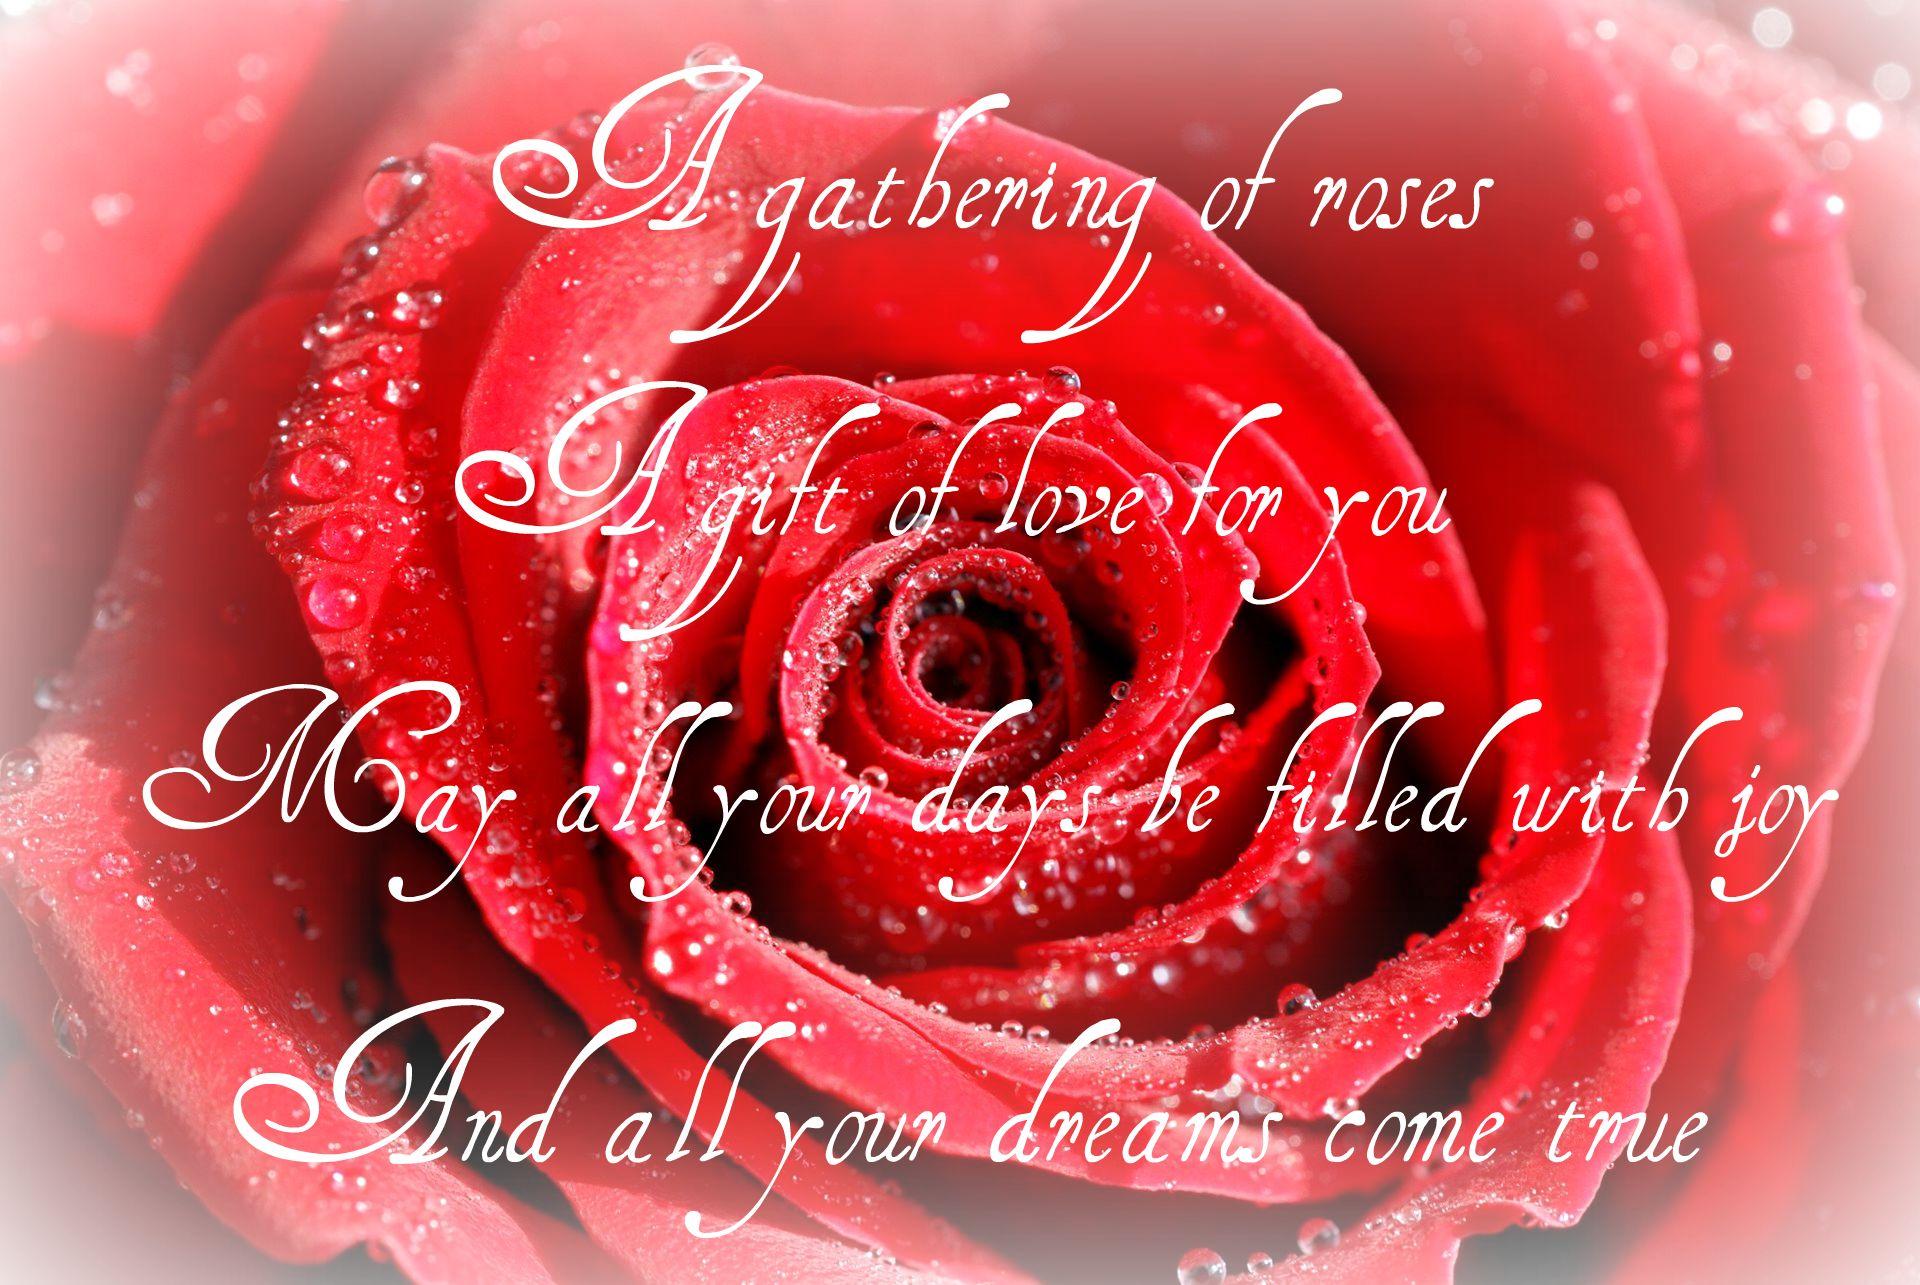 image rose poem jpg demigods haven wiki fandom powered by wikia